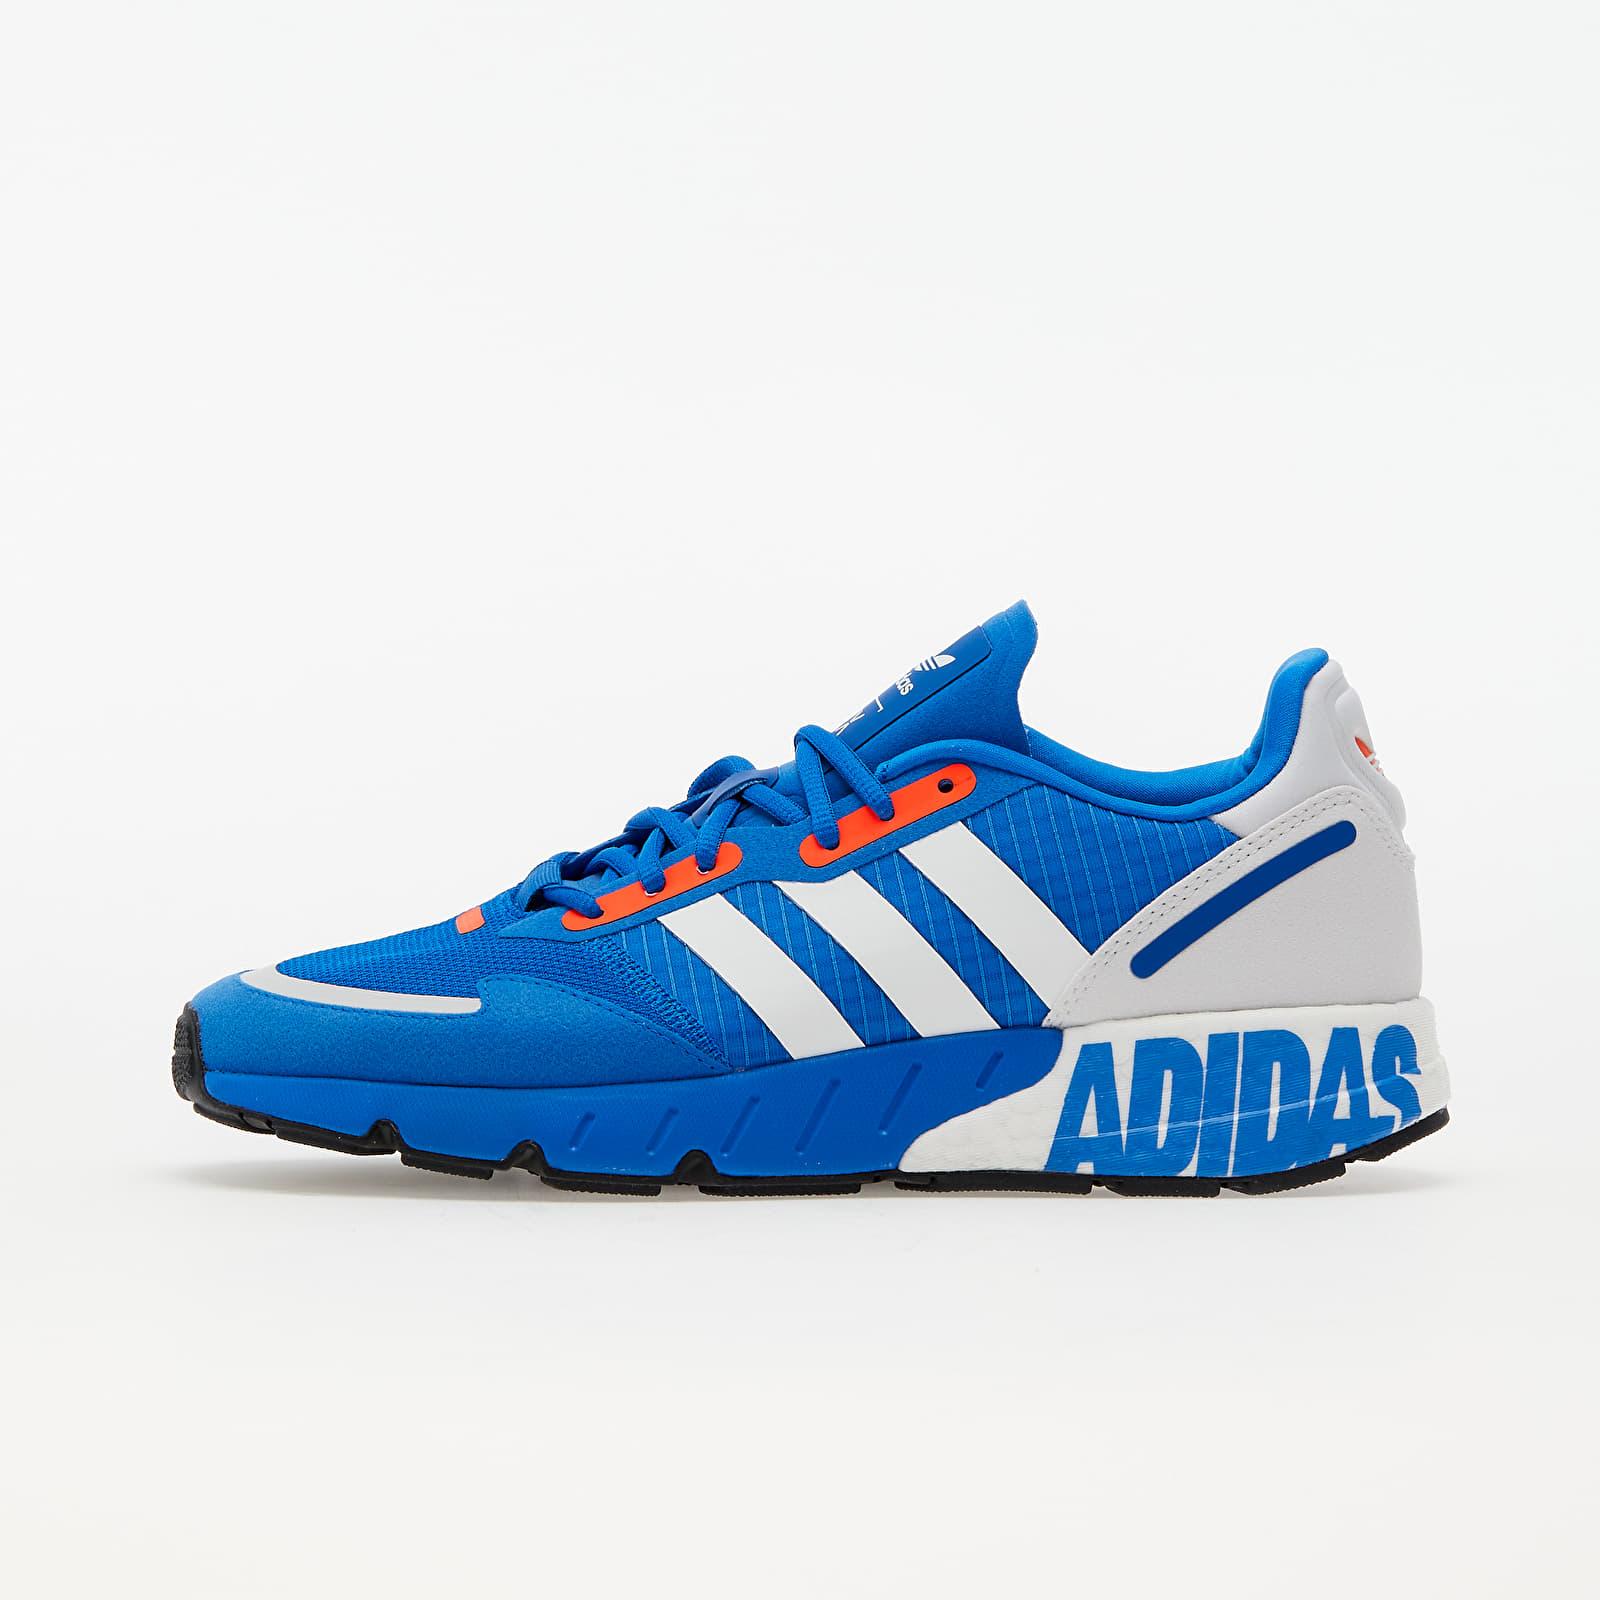 adidas ZX 1K Boost Glow Blue/ Ftw White/ Solar Red EUR 46